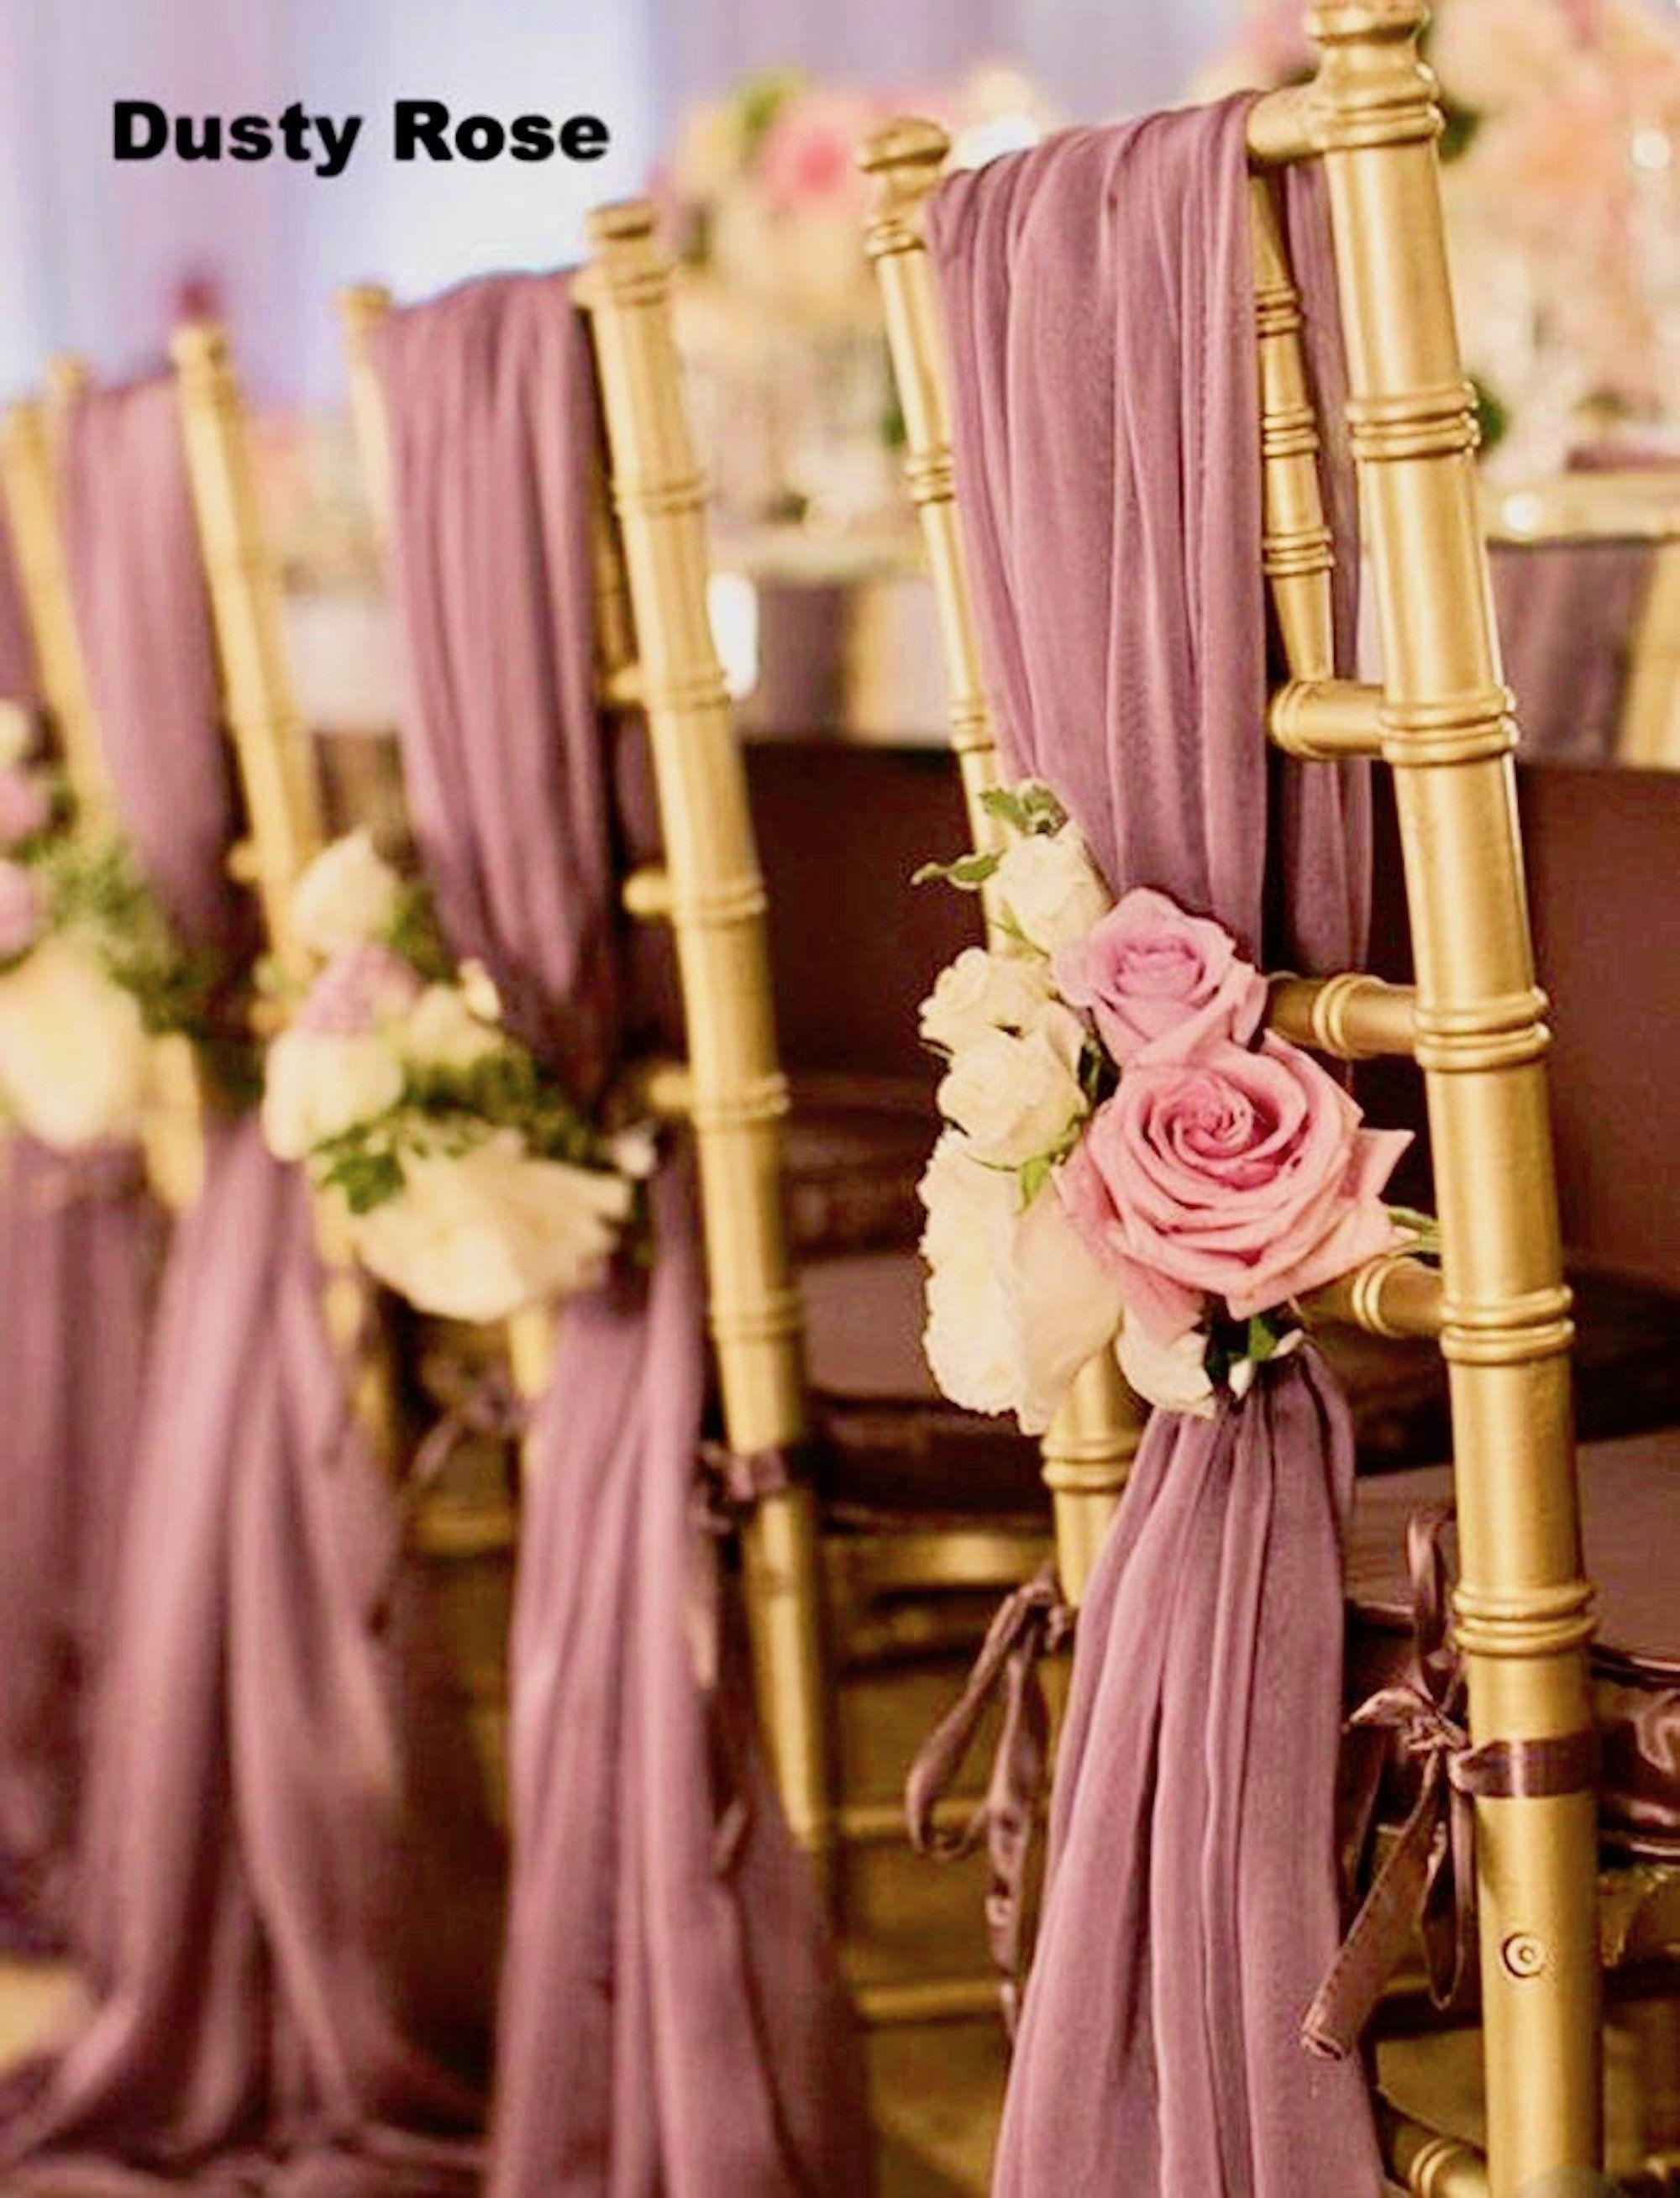 Sale 50 Chair Sashes Wedding Decor Wedding Chair Covers Chair Sash Chiffon Chair Sash Wedding Chair Covers Chiavari Chair Cover Sash In 2020 Wedding Chair Decorations Wedding Chair Sashes Wedding Chairs